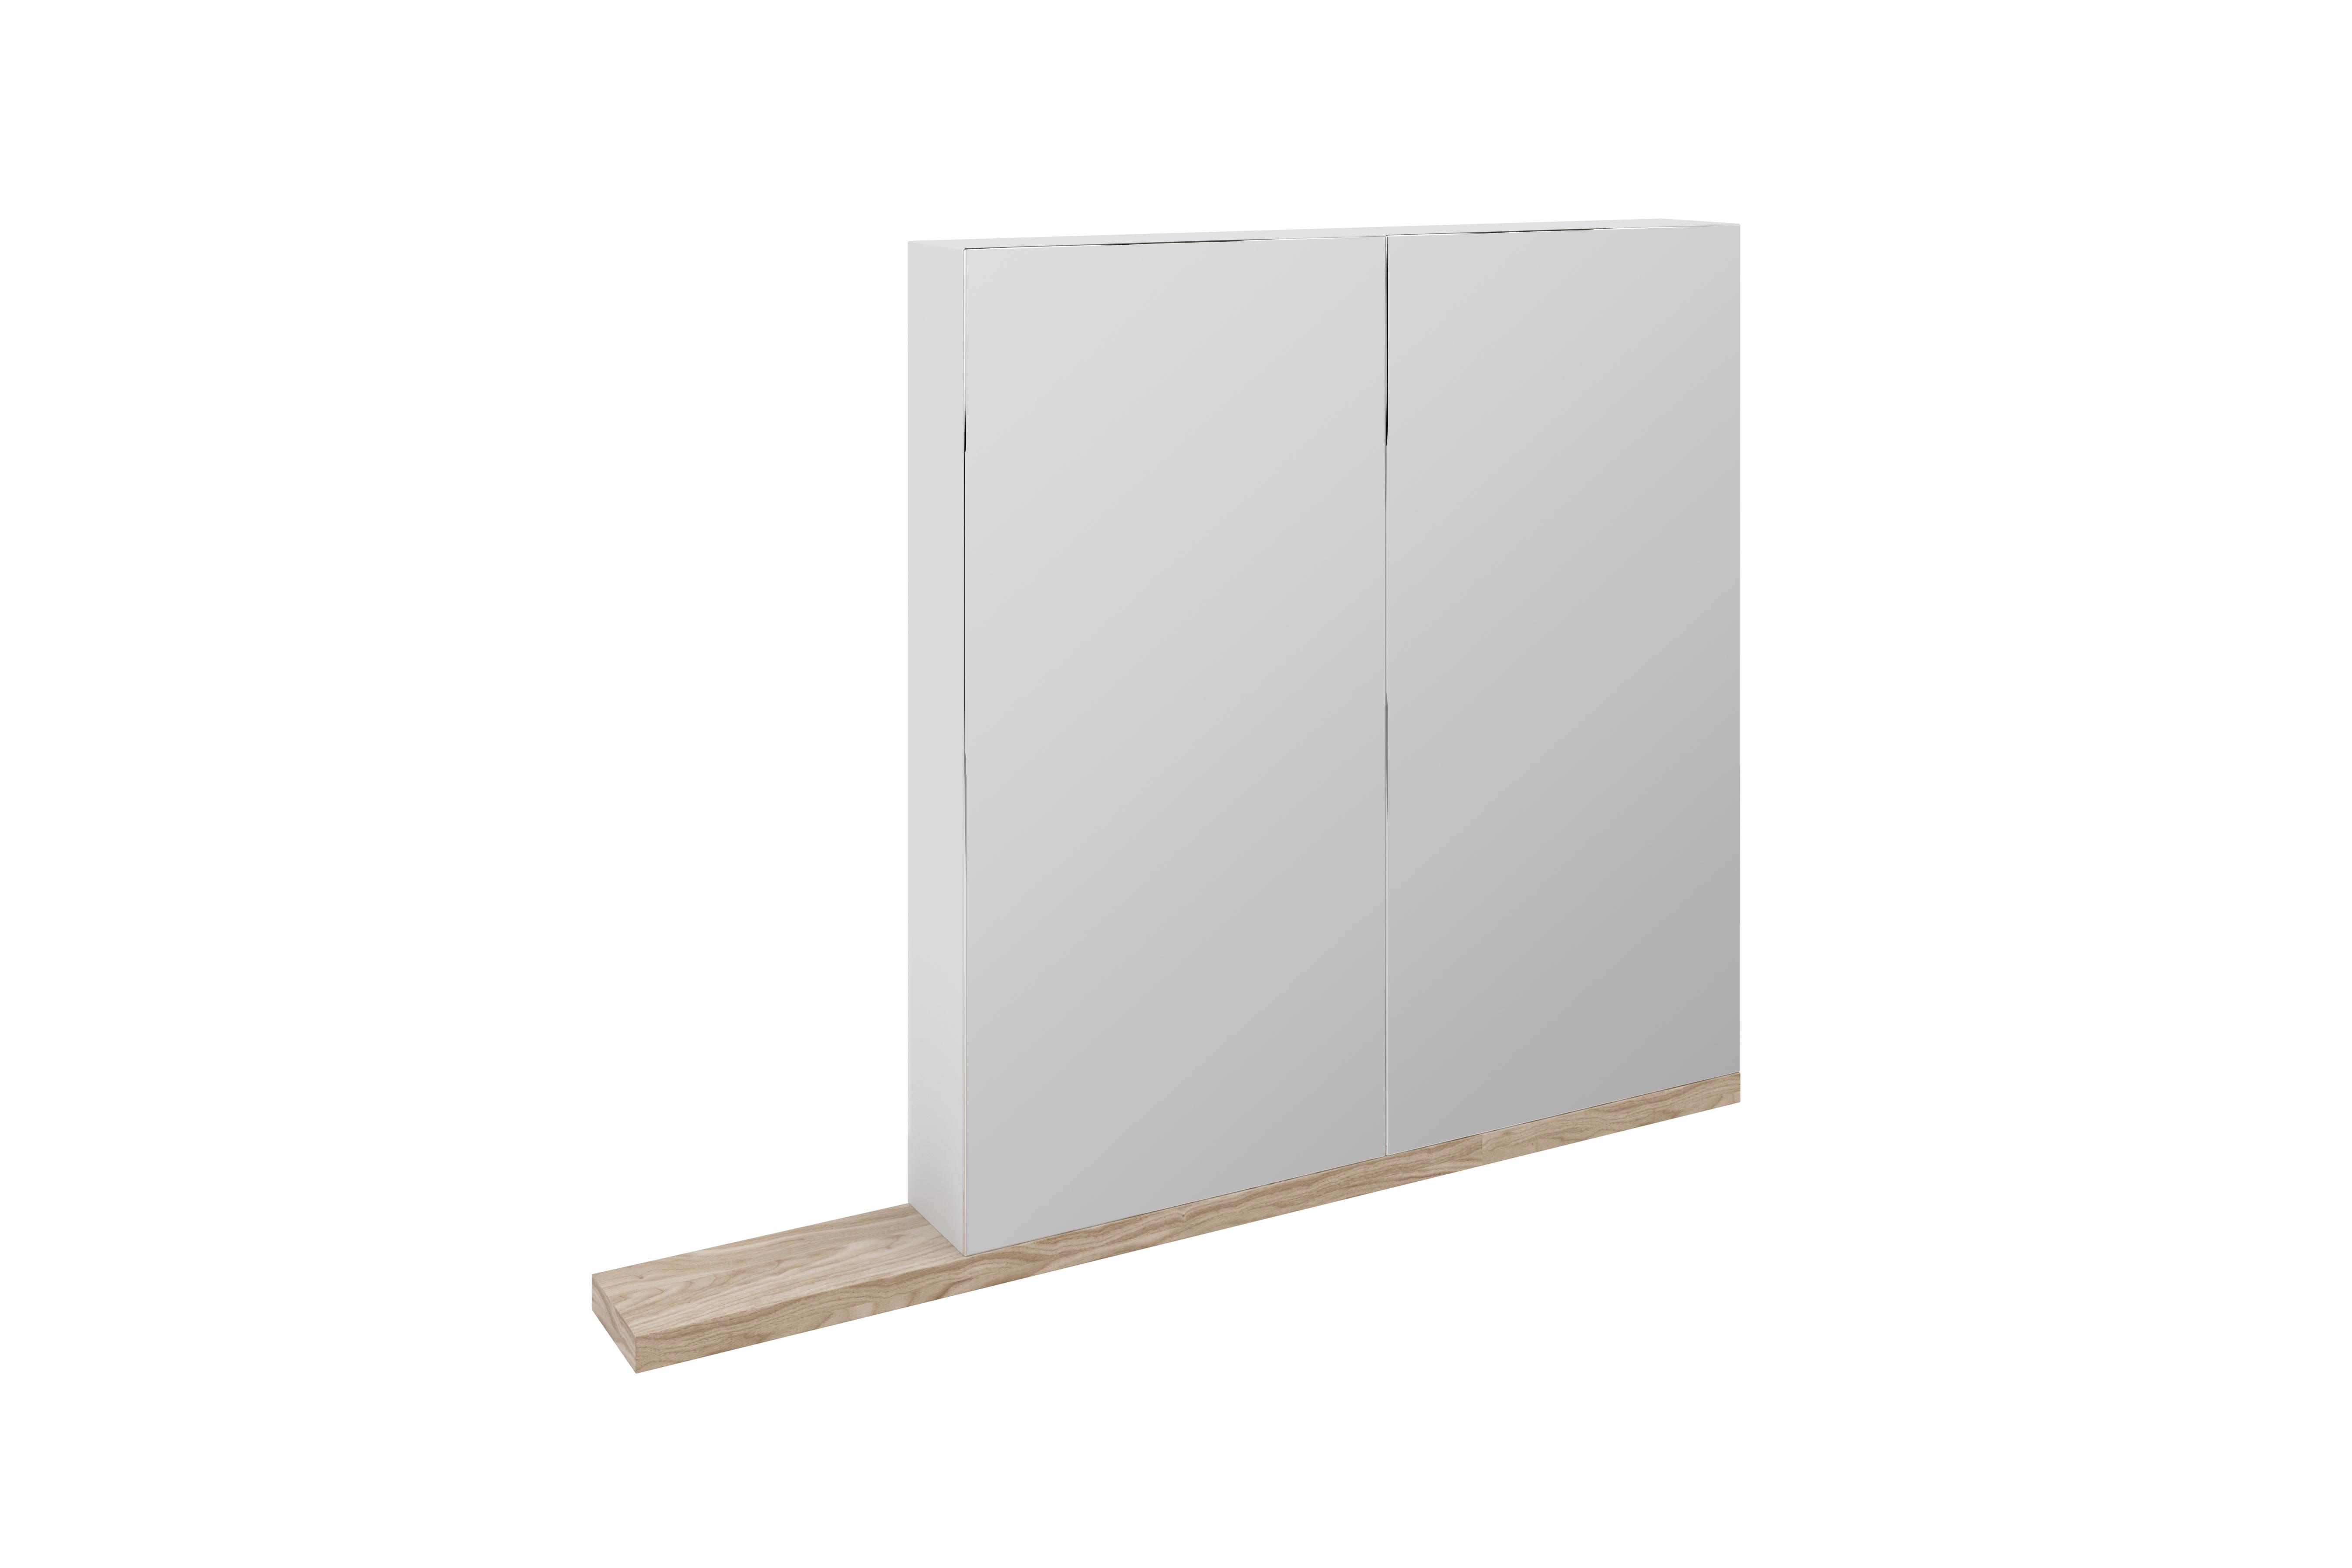 Maui_Cabinet_1200_Left_White